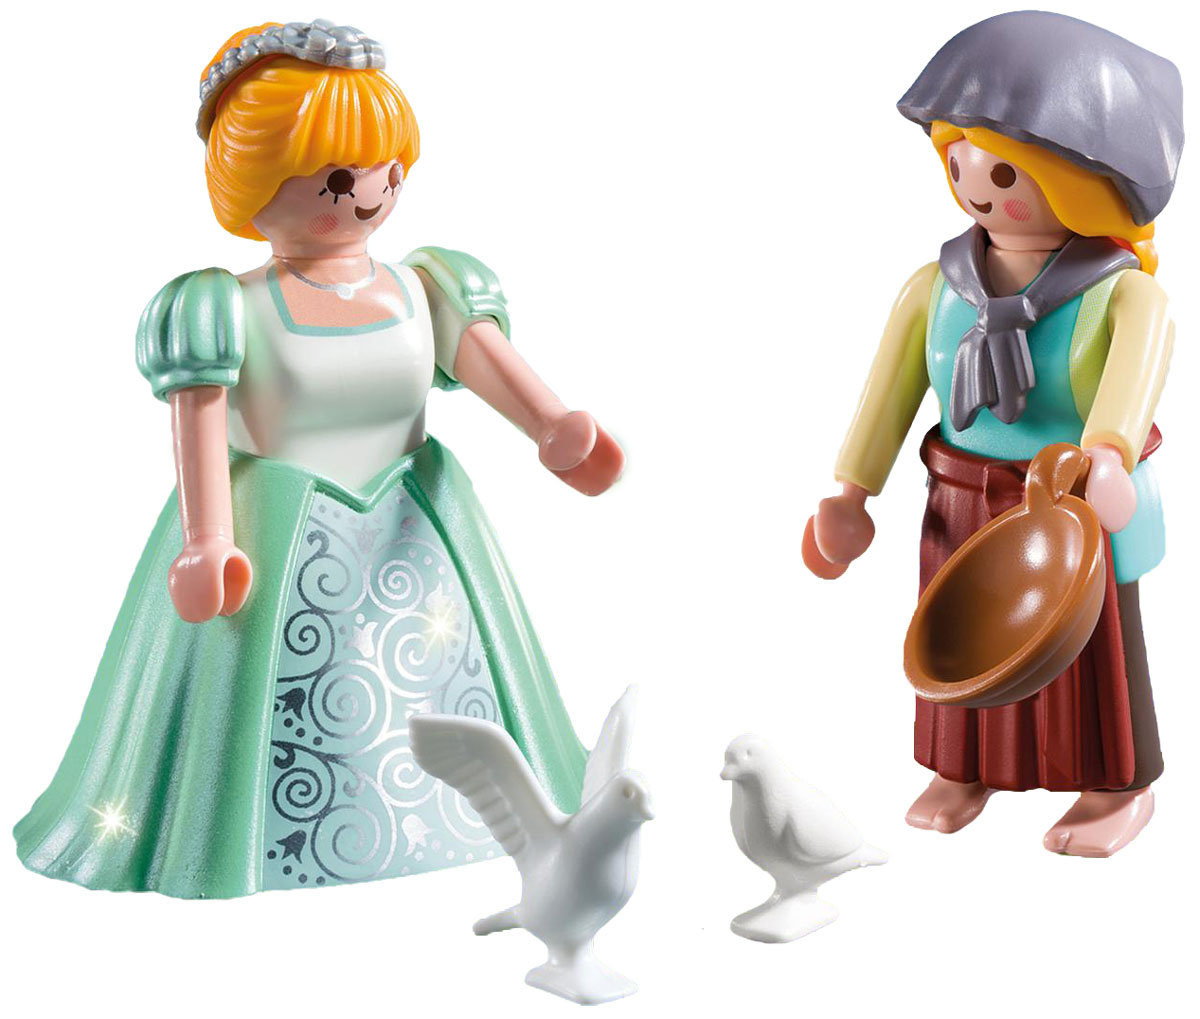 Playmobil Игровой набор Принцесса и служанка фигурки игрушки playmobil зоопарк стая фламинго